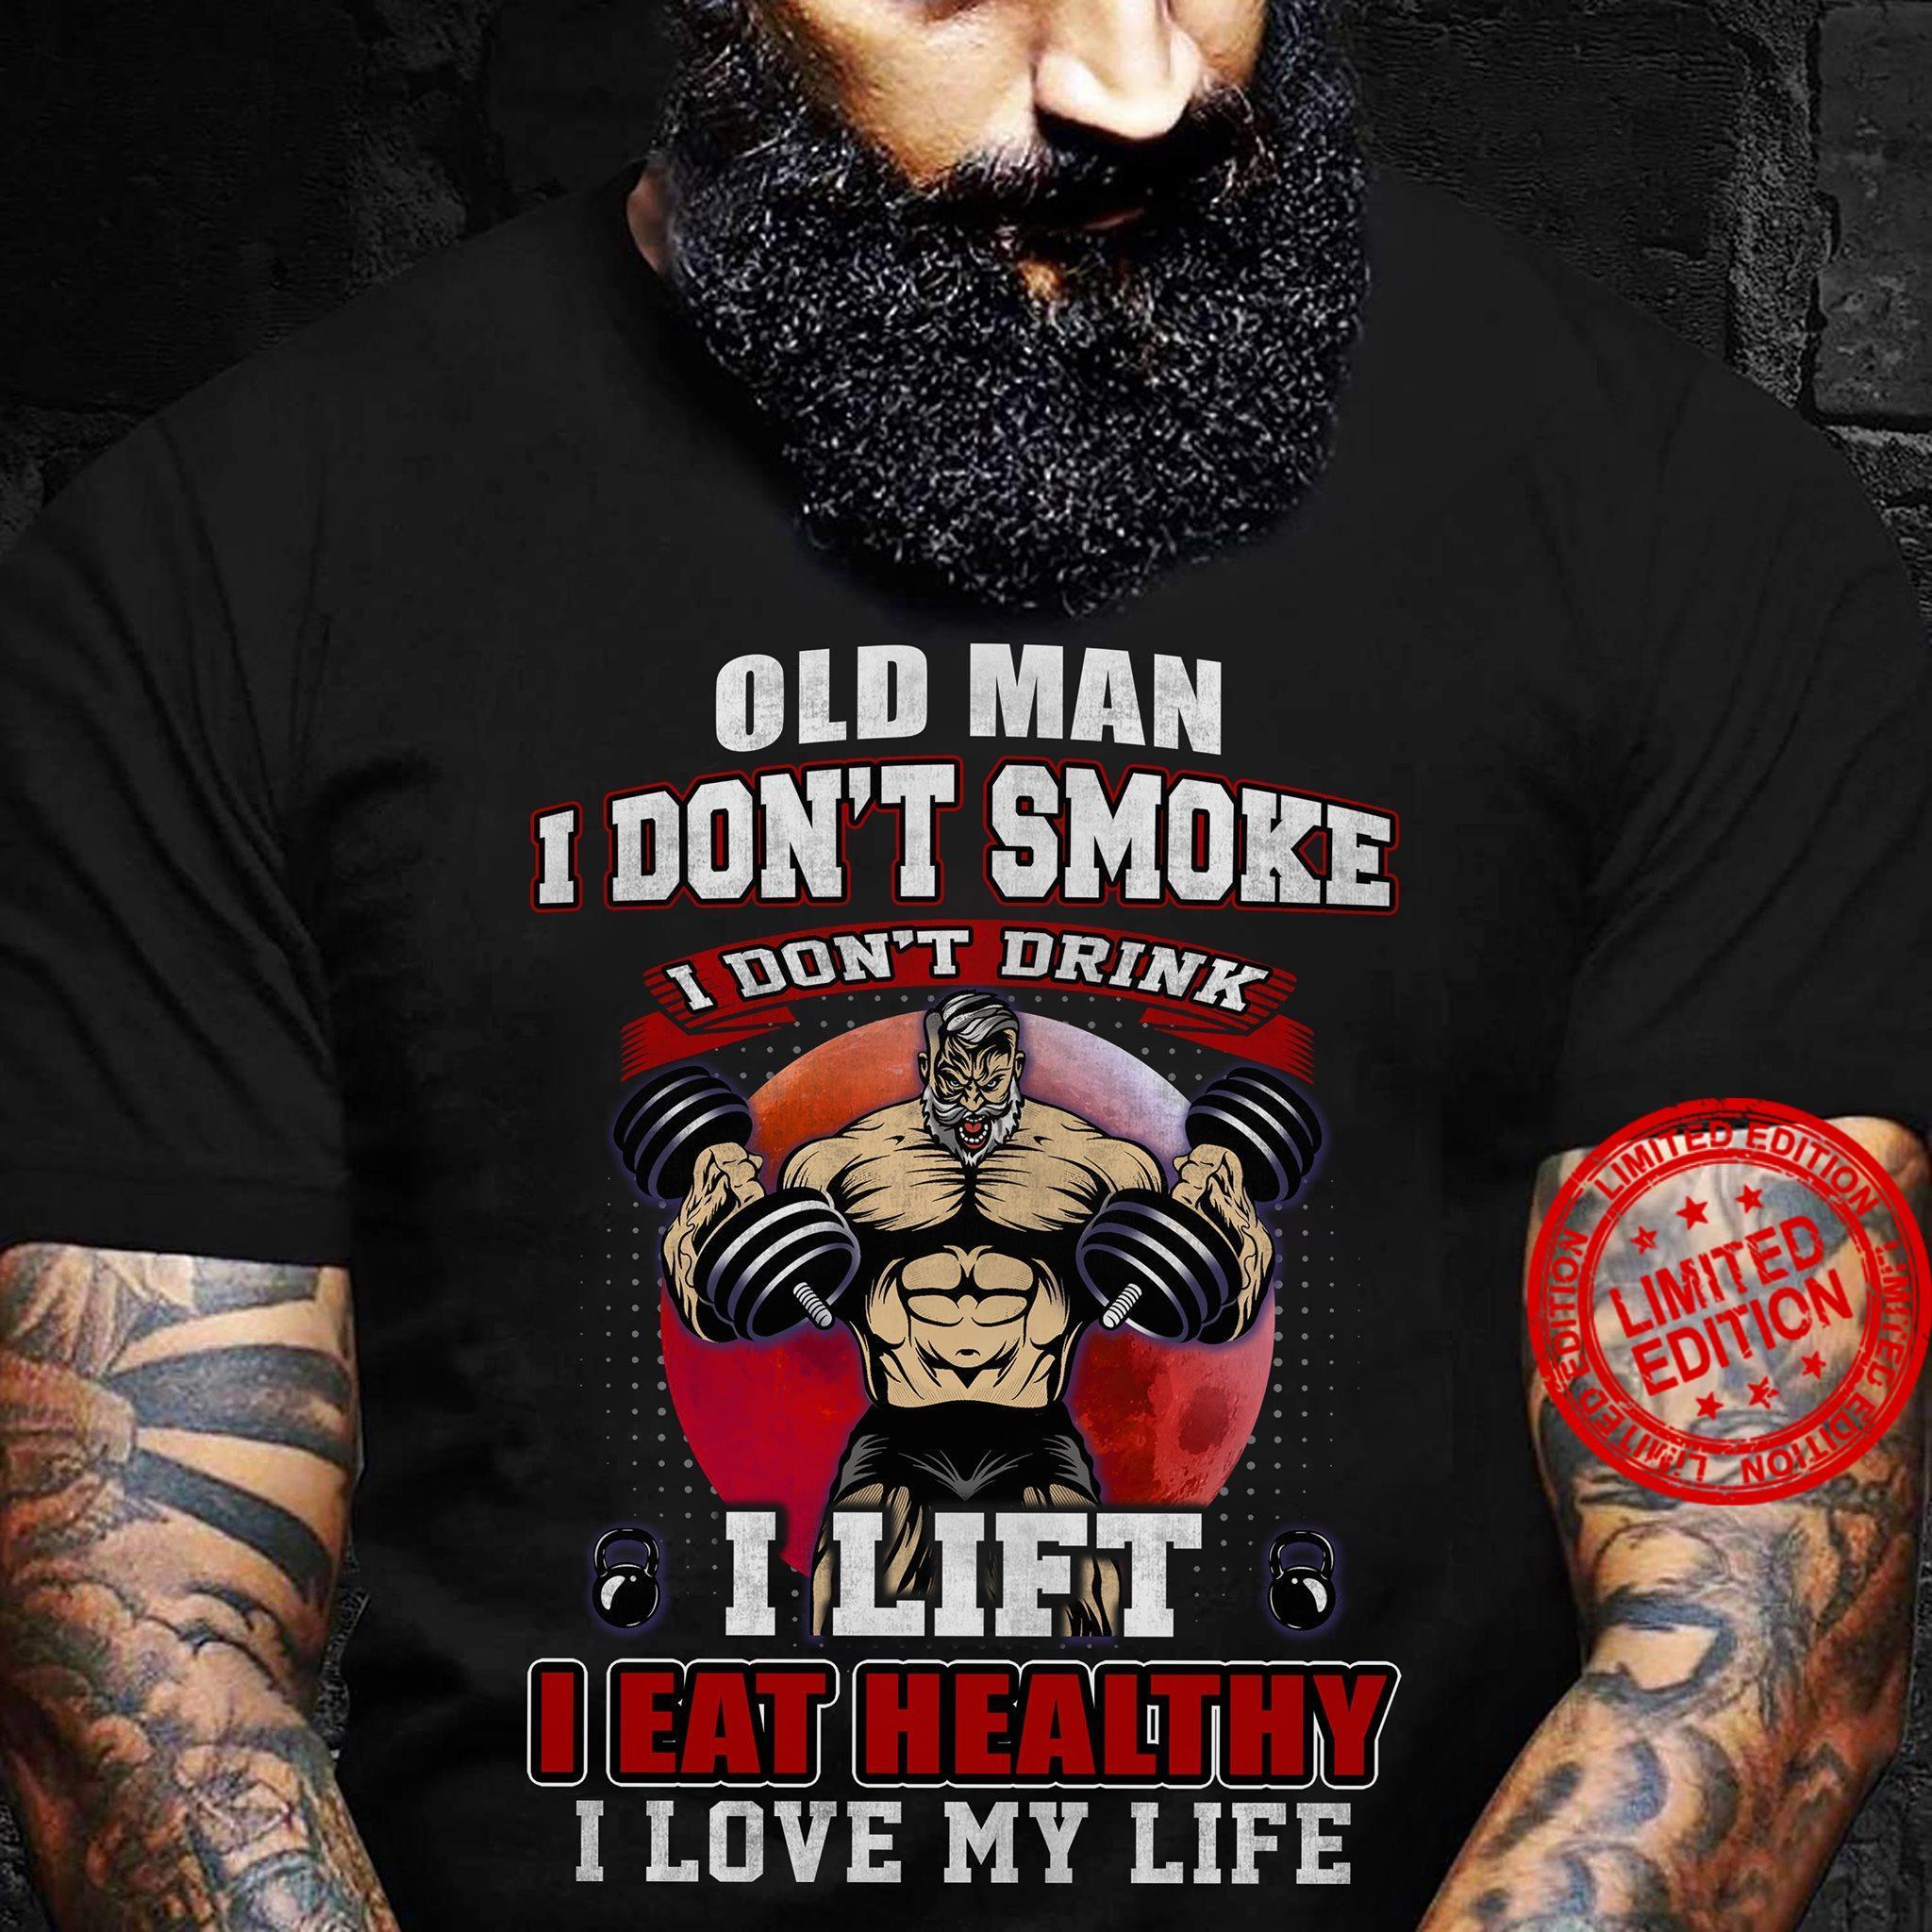 Old Man I Don't Smoke I Don't Drink I Lift I Eat Healthy I Love My Life Shirt